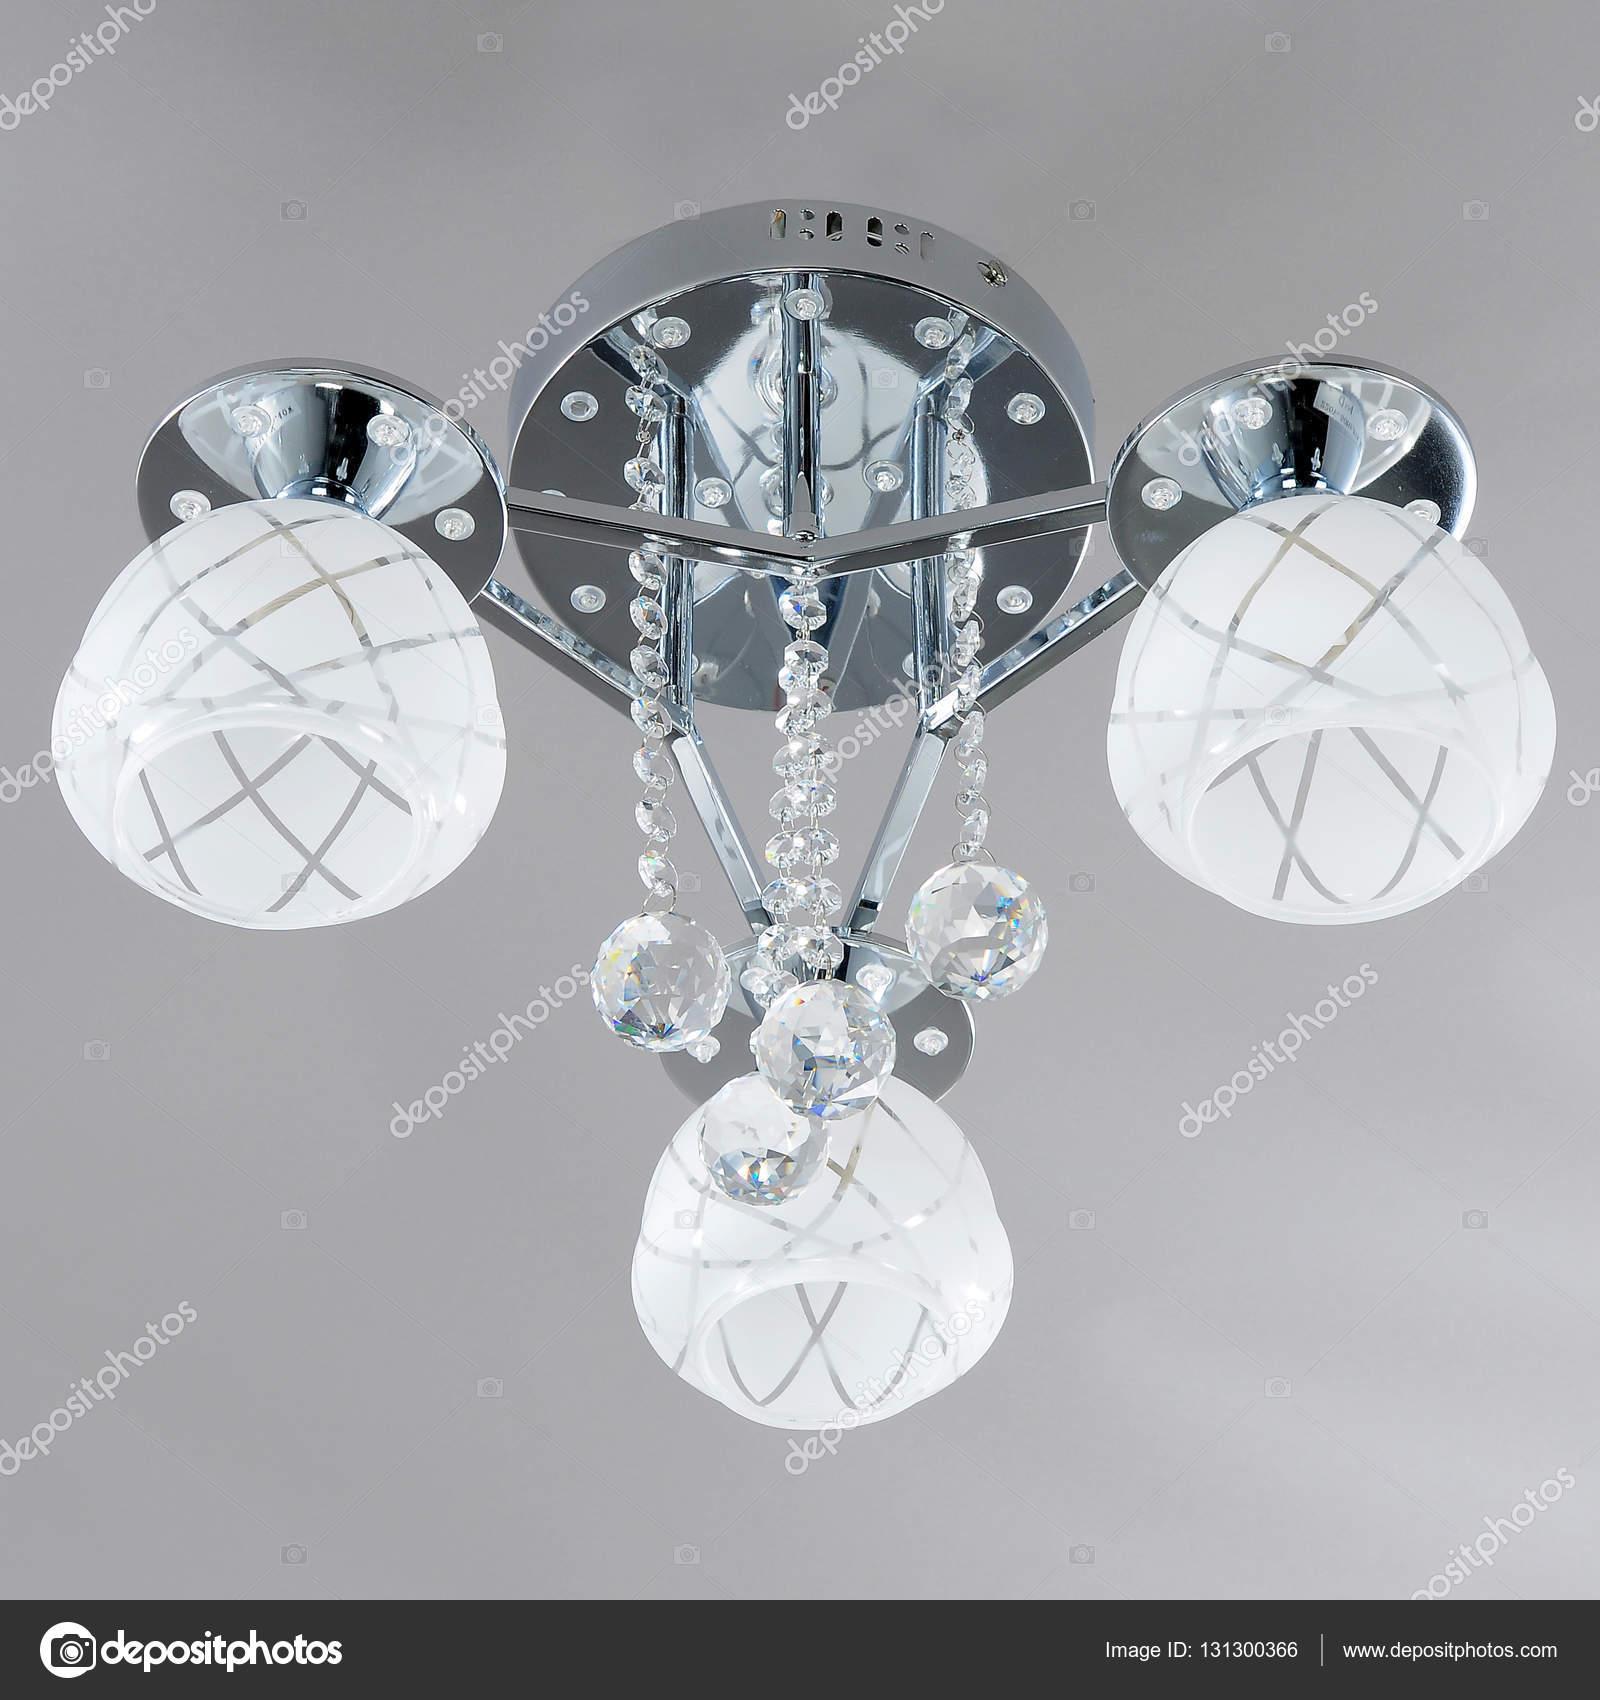 beleuchtung in innenräumen innenräume zimmer kristallkronleuchter beleuchtung für innenräume stockfoto